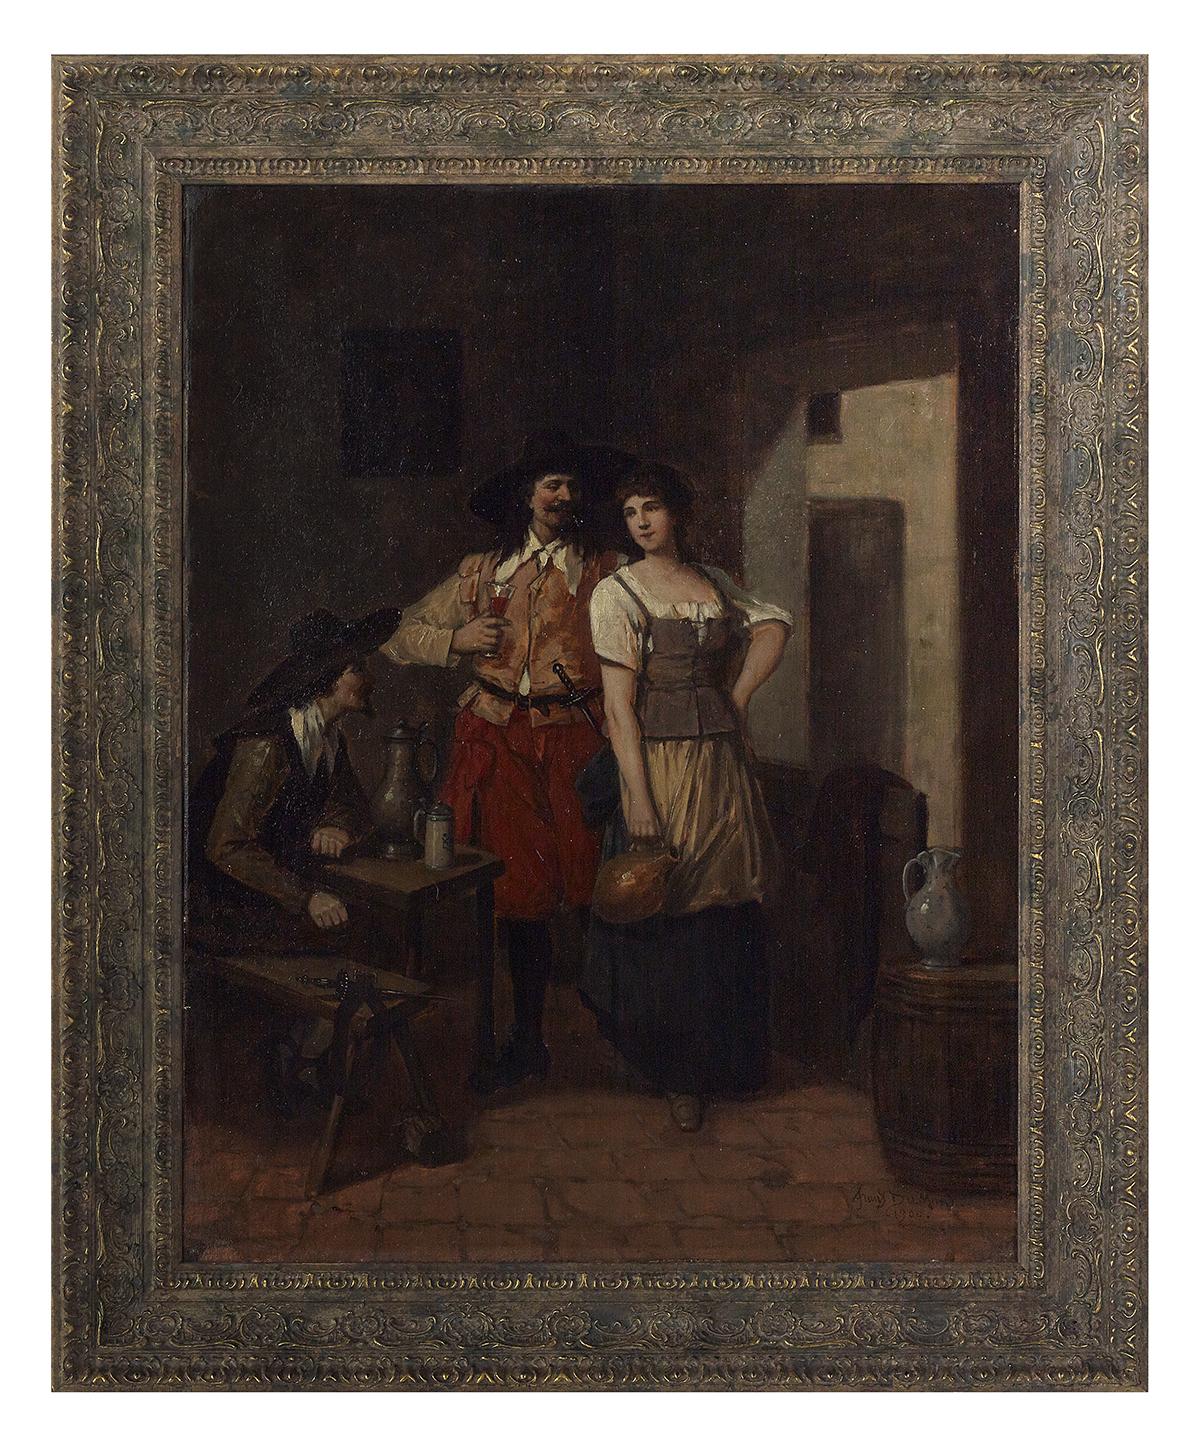 Lot 89 - Francois Dumont (Belgian, b. 1850)